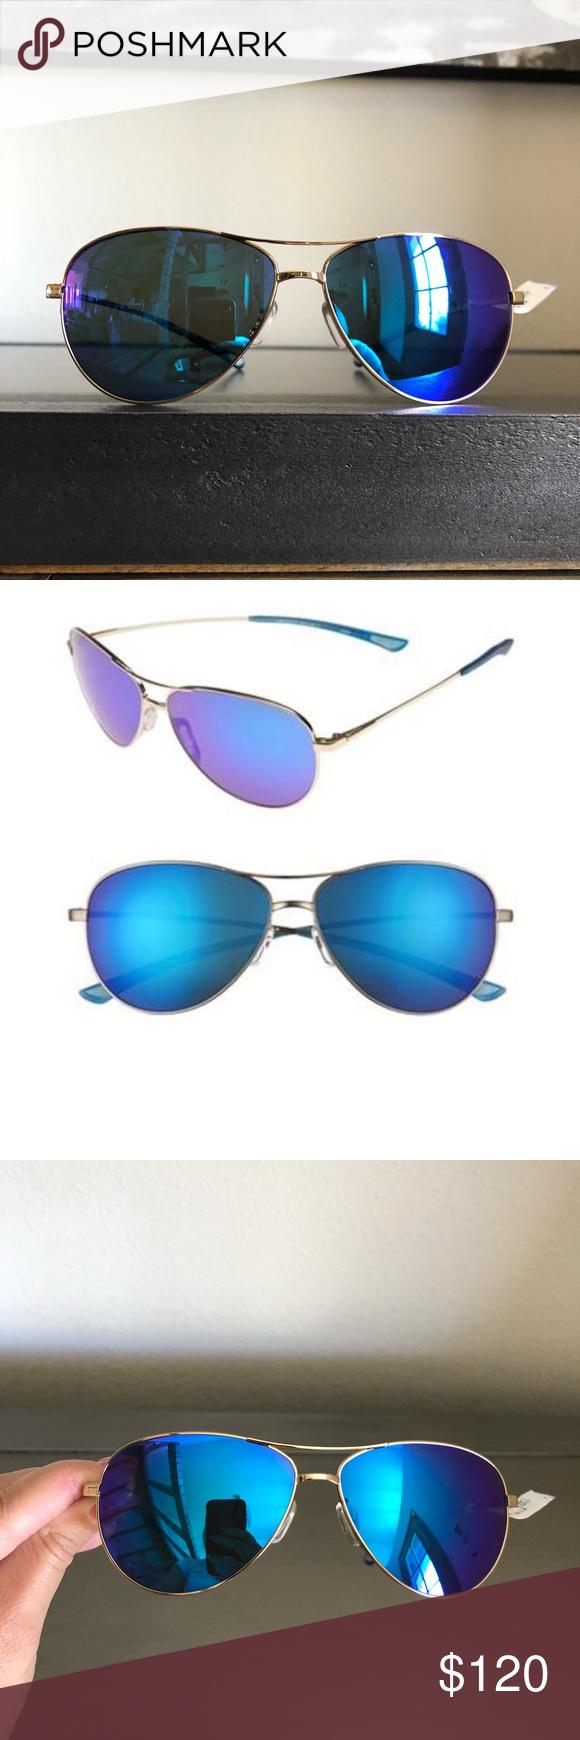 94b534503e923 🆕Smith Langley Carbonic Polarized Sunglasses Smith Langley Carbonic  Polarized Sunglasses Gold Frame Blue Mirror Lens